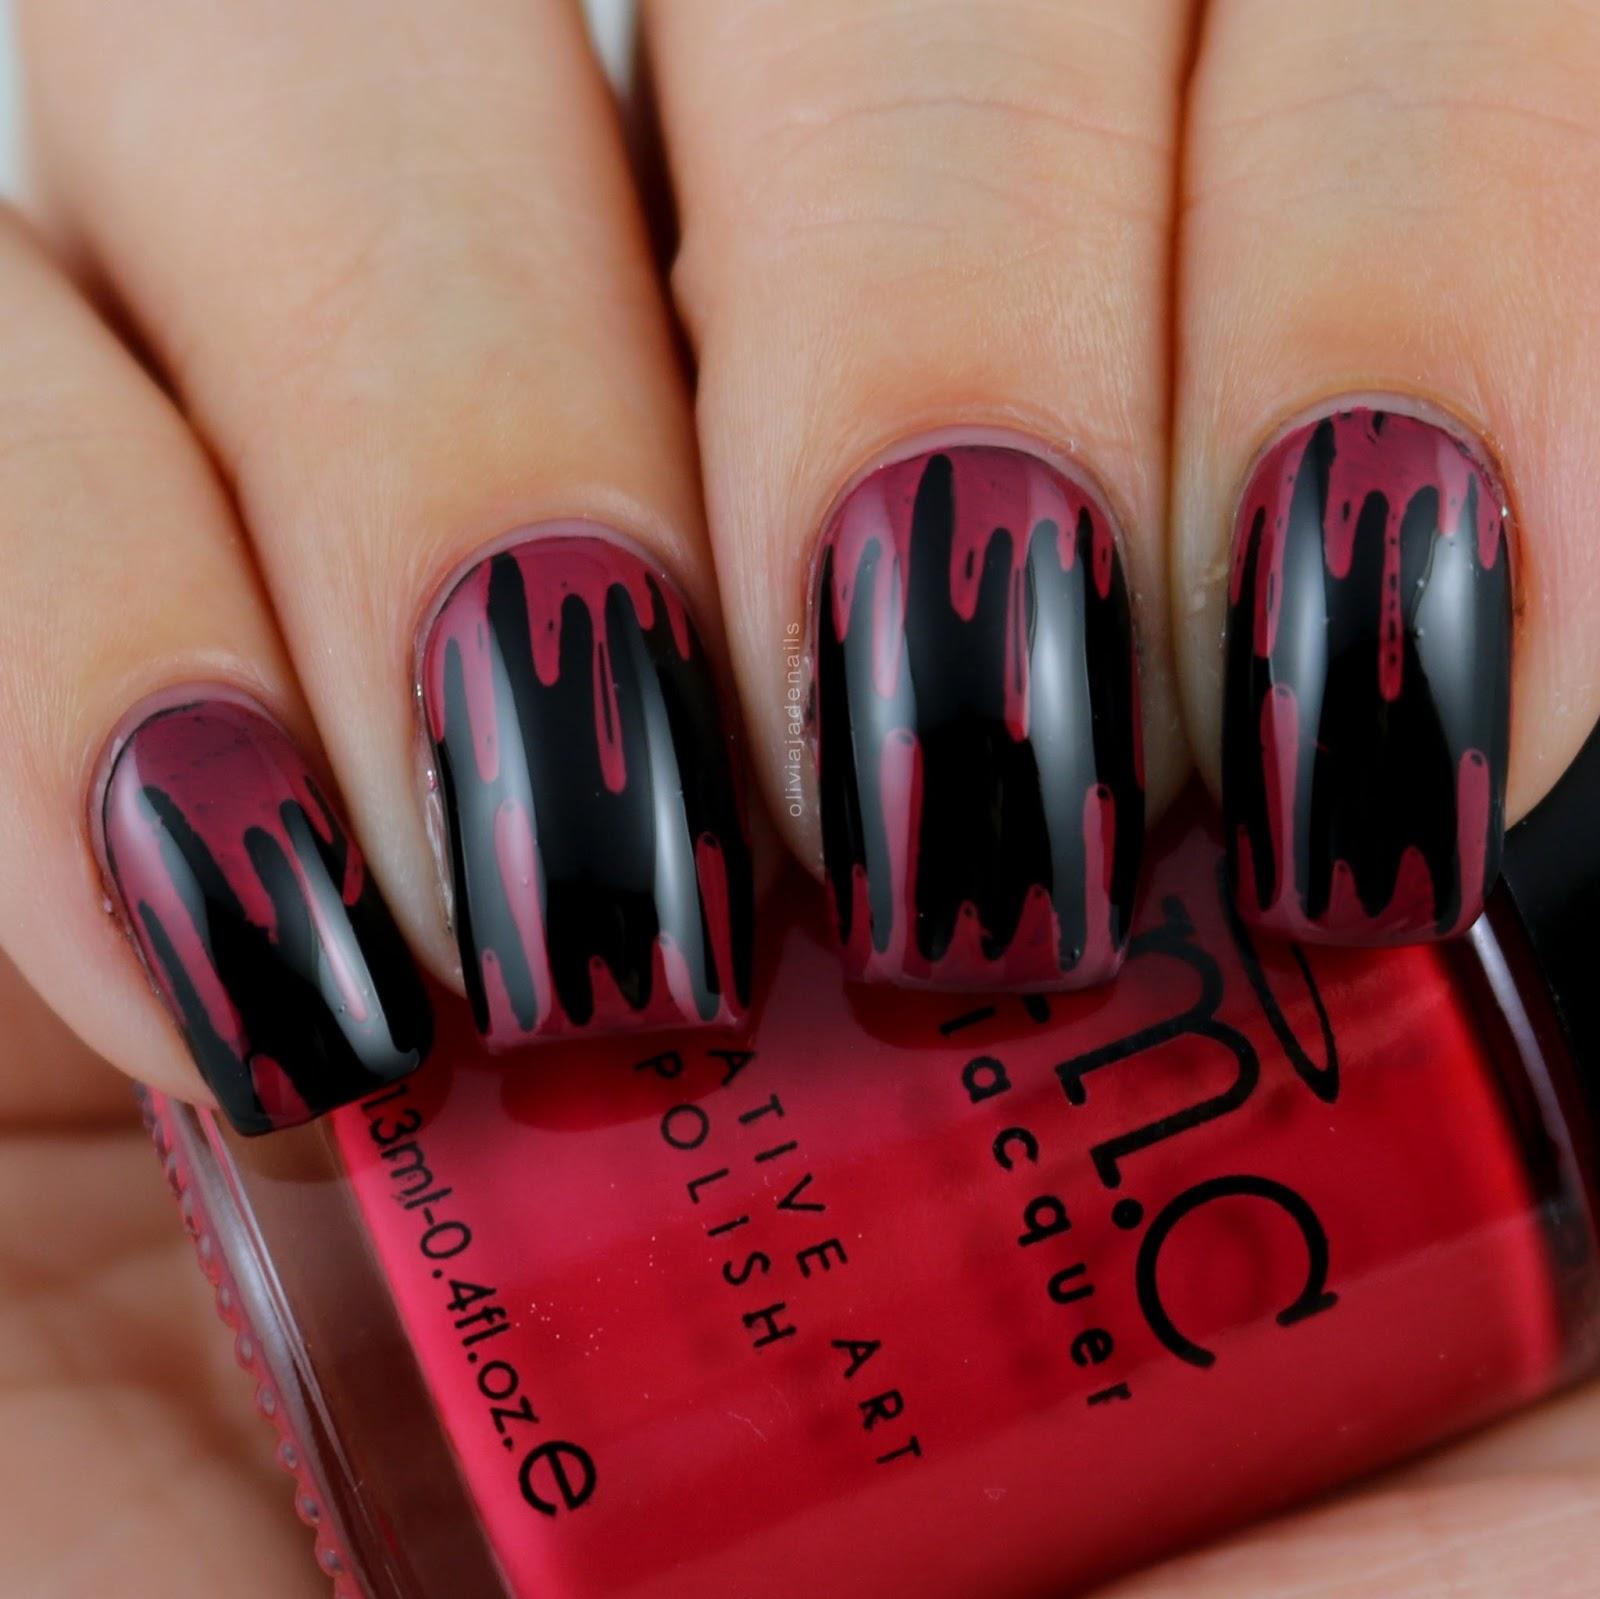 Olivia jade nails 26 great nail art ideas challenge friday 13th here prinsesfo Choice Image